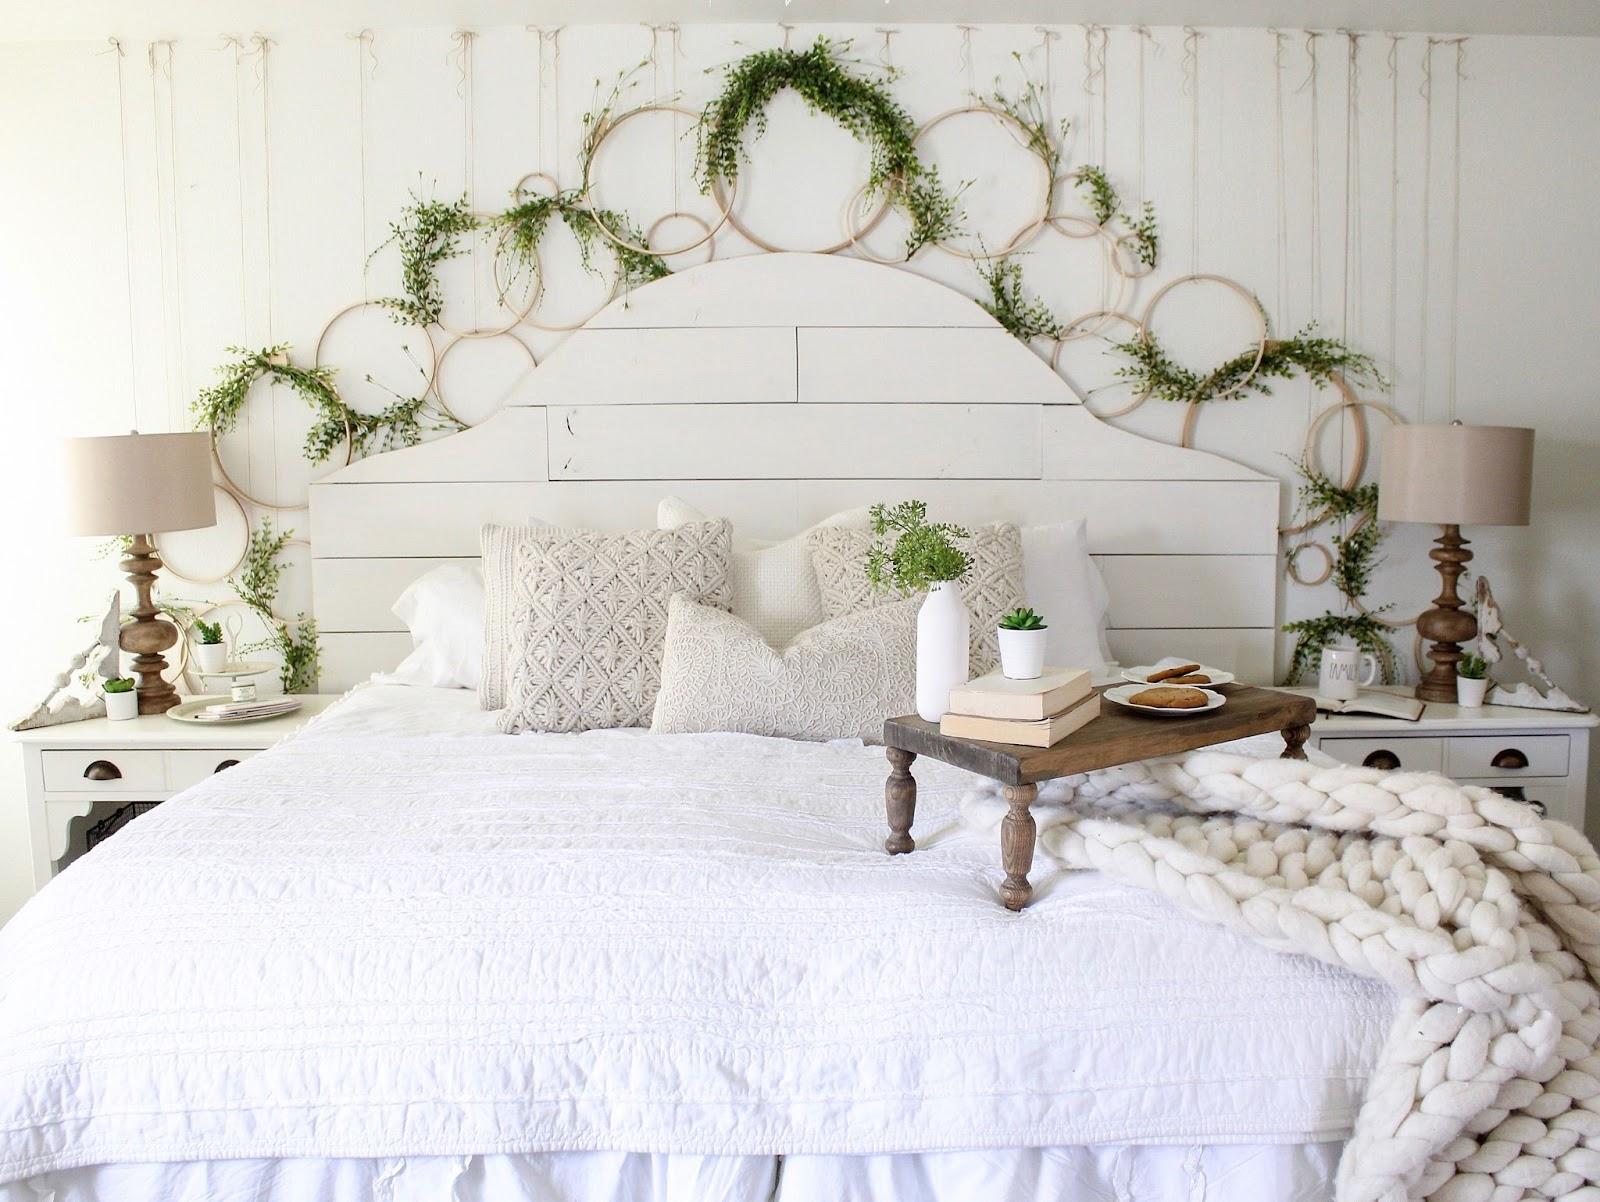 Farmhouse Bedroom with Spring Wreath